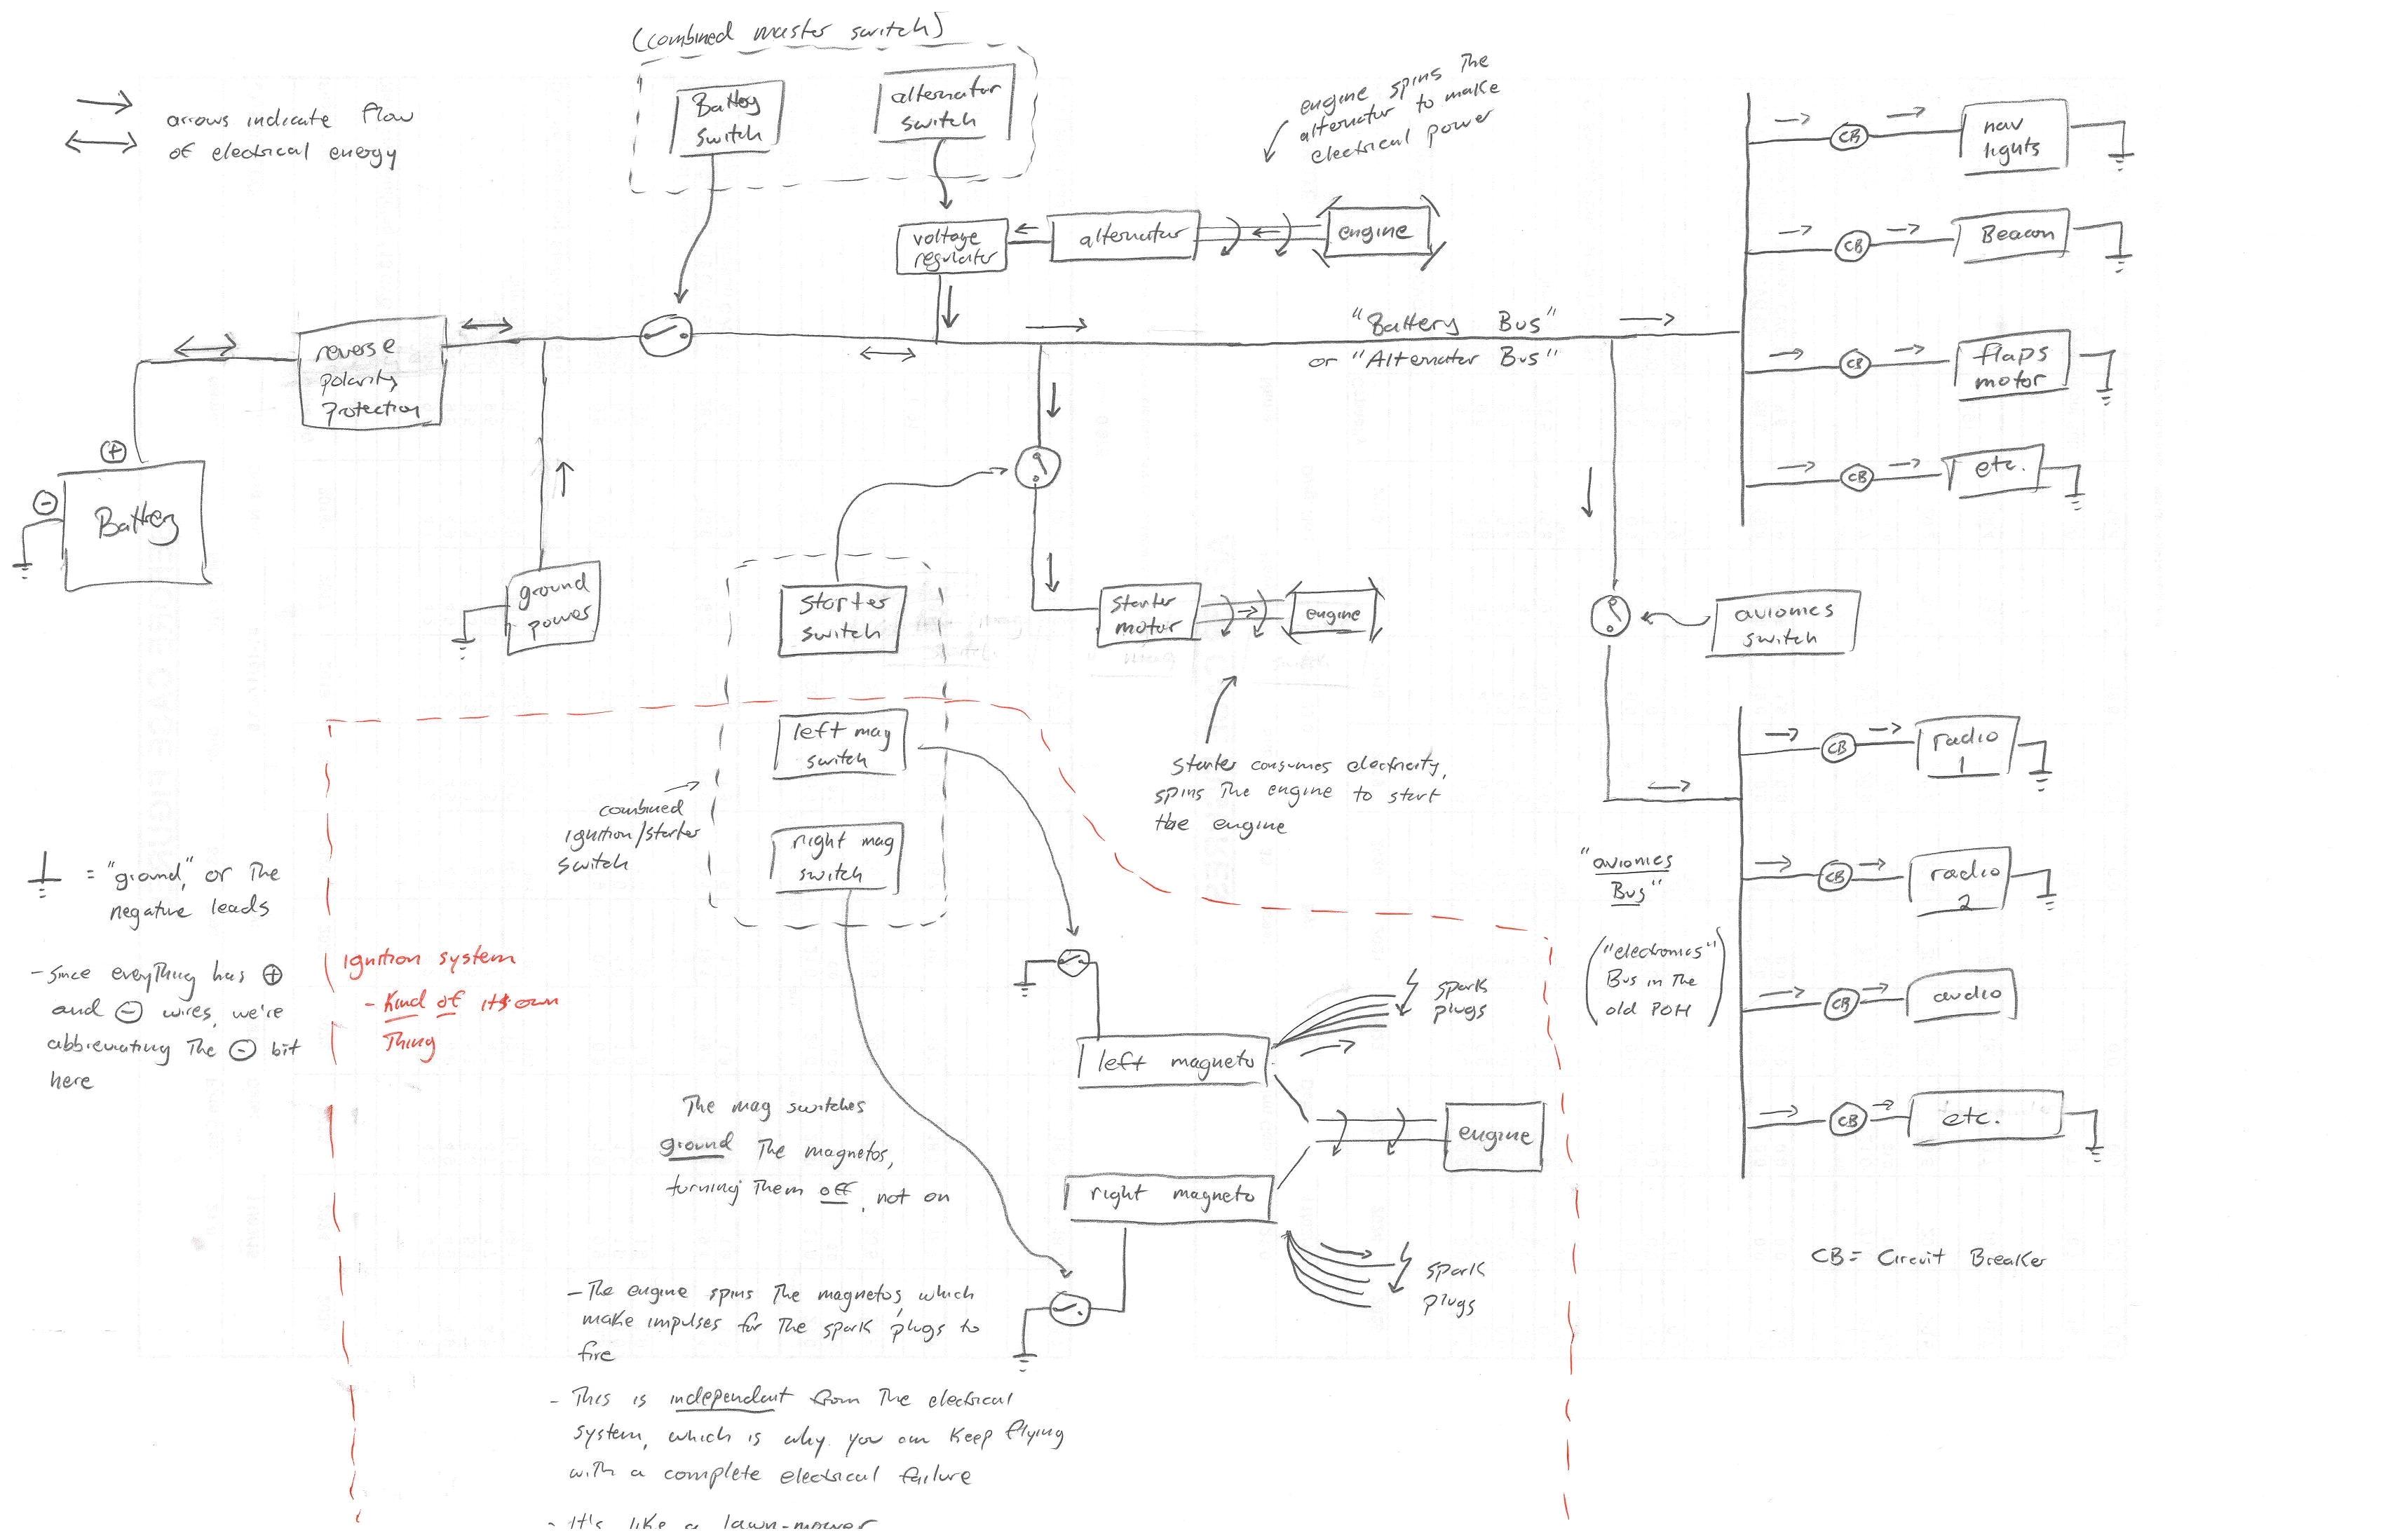 cessna 140 rebirth electrical loads wiring wiring diagram blog cessna 140 rebirth electrical loads wiring wiring